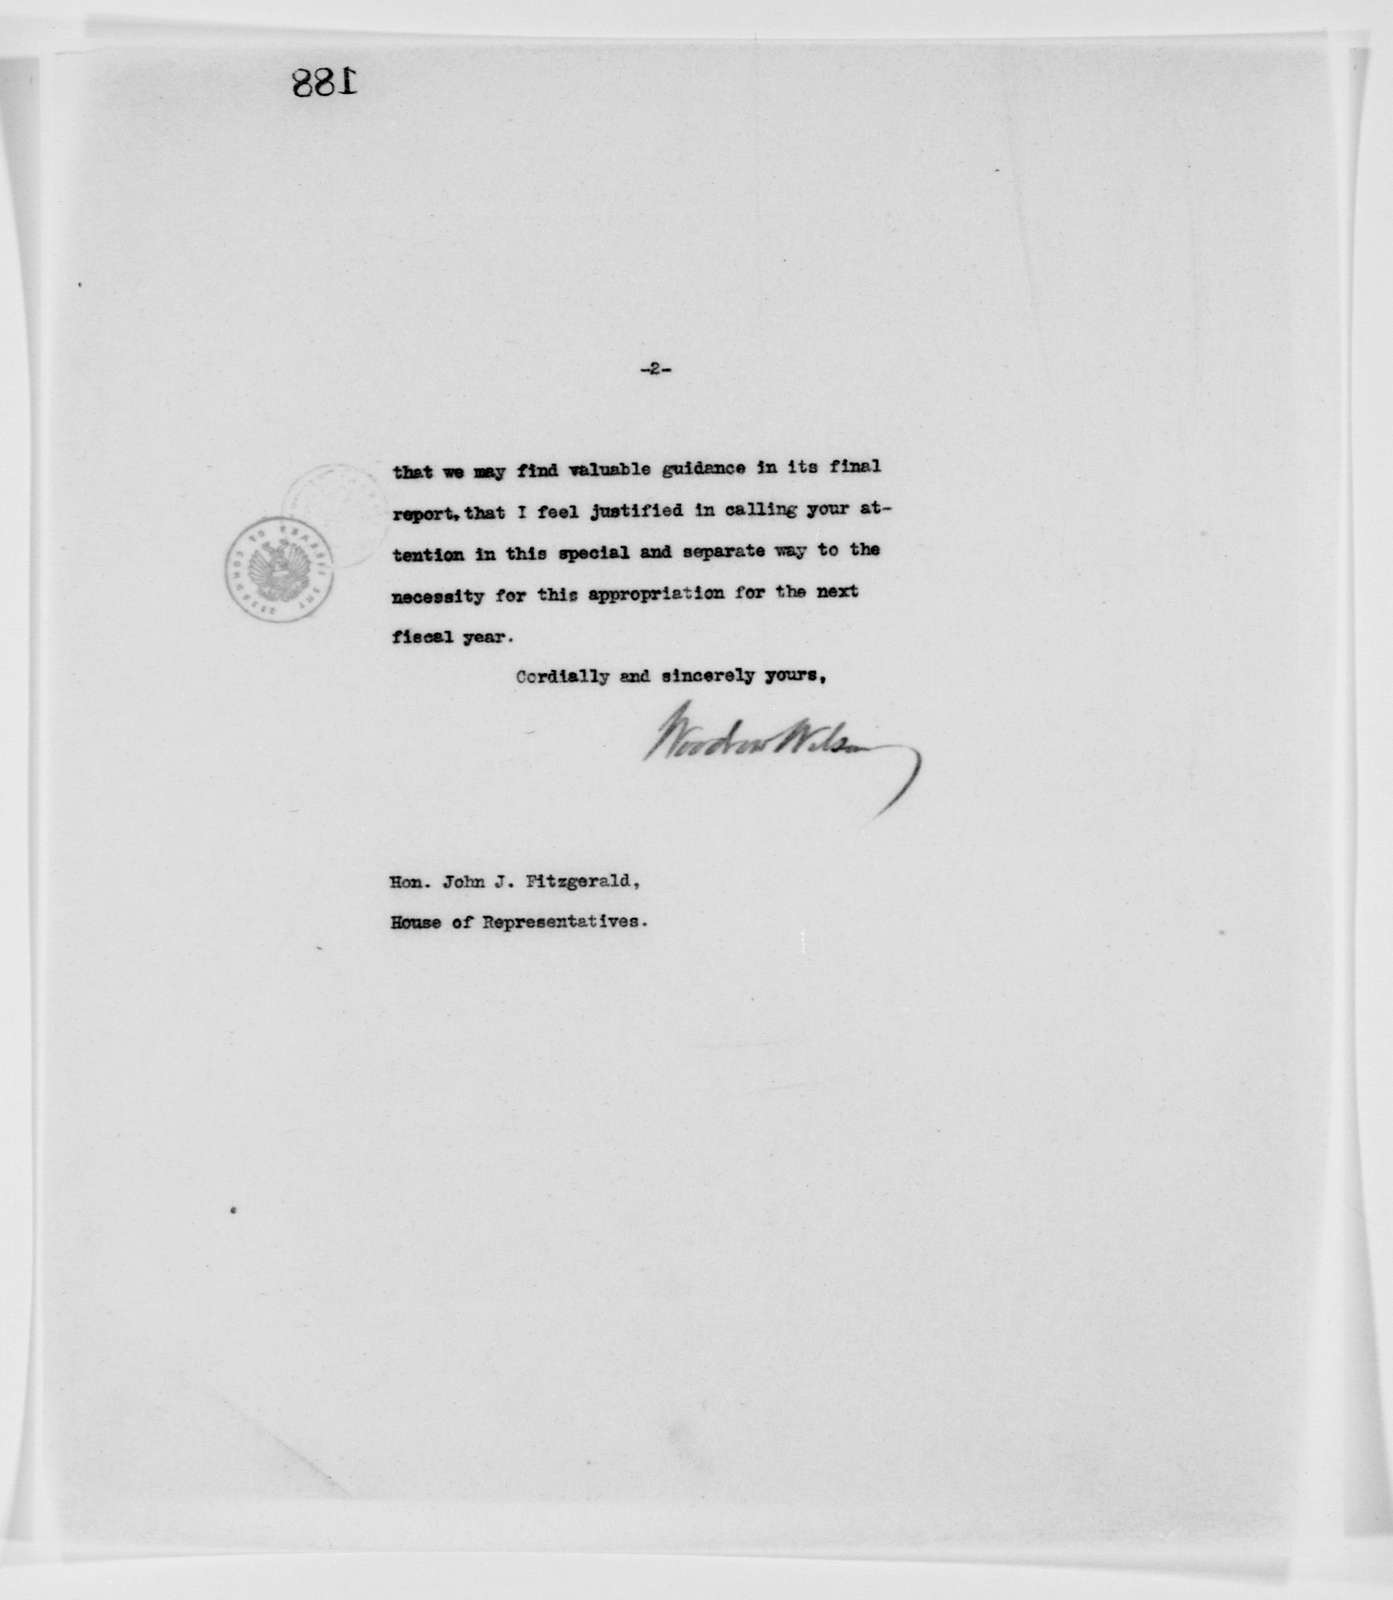 Woodrow Wilson Papers: Series 3: Letterbooks, 1913-1921; Vol. 2, 1913, Mar. 30-Apr. 24